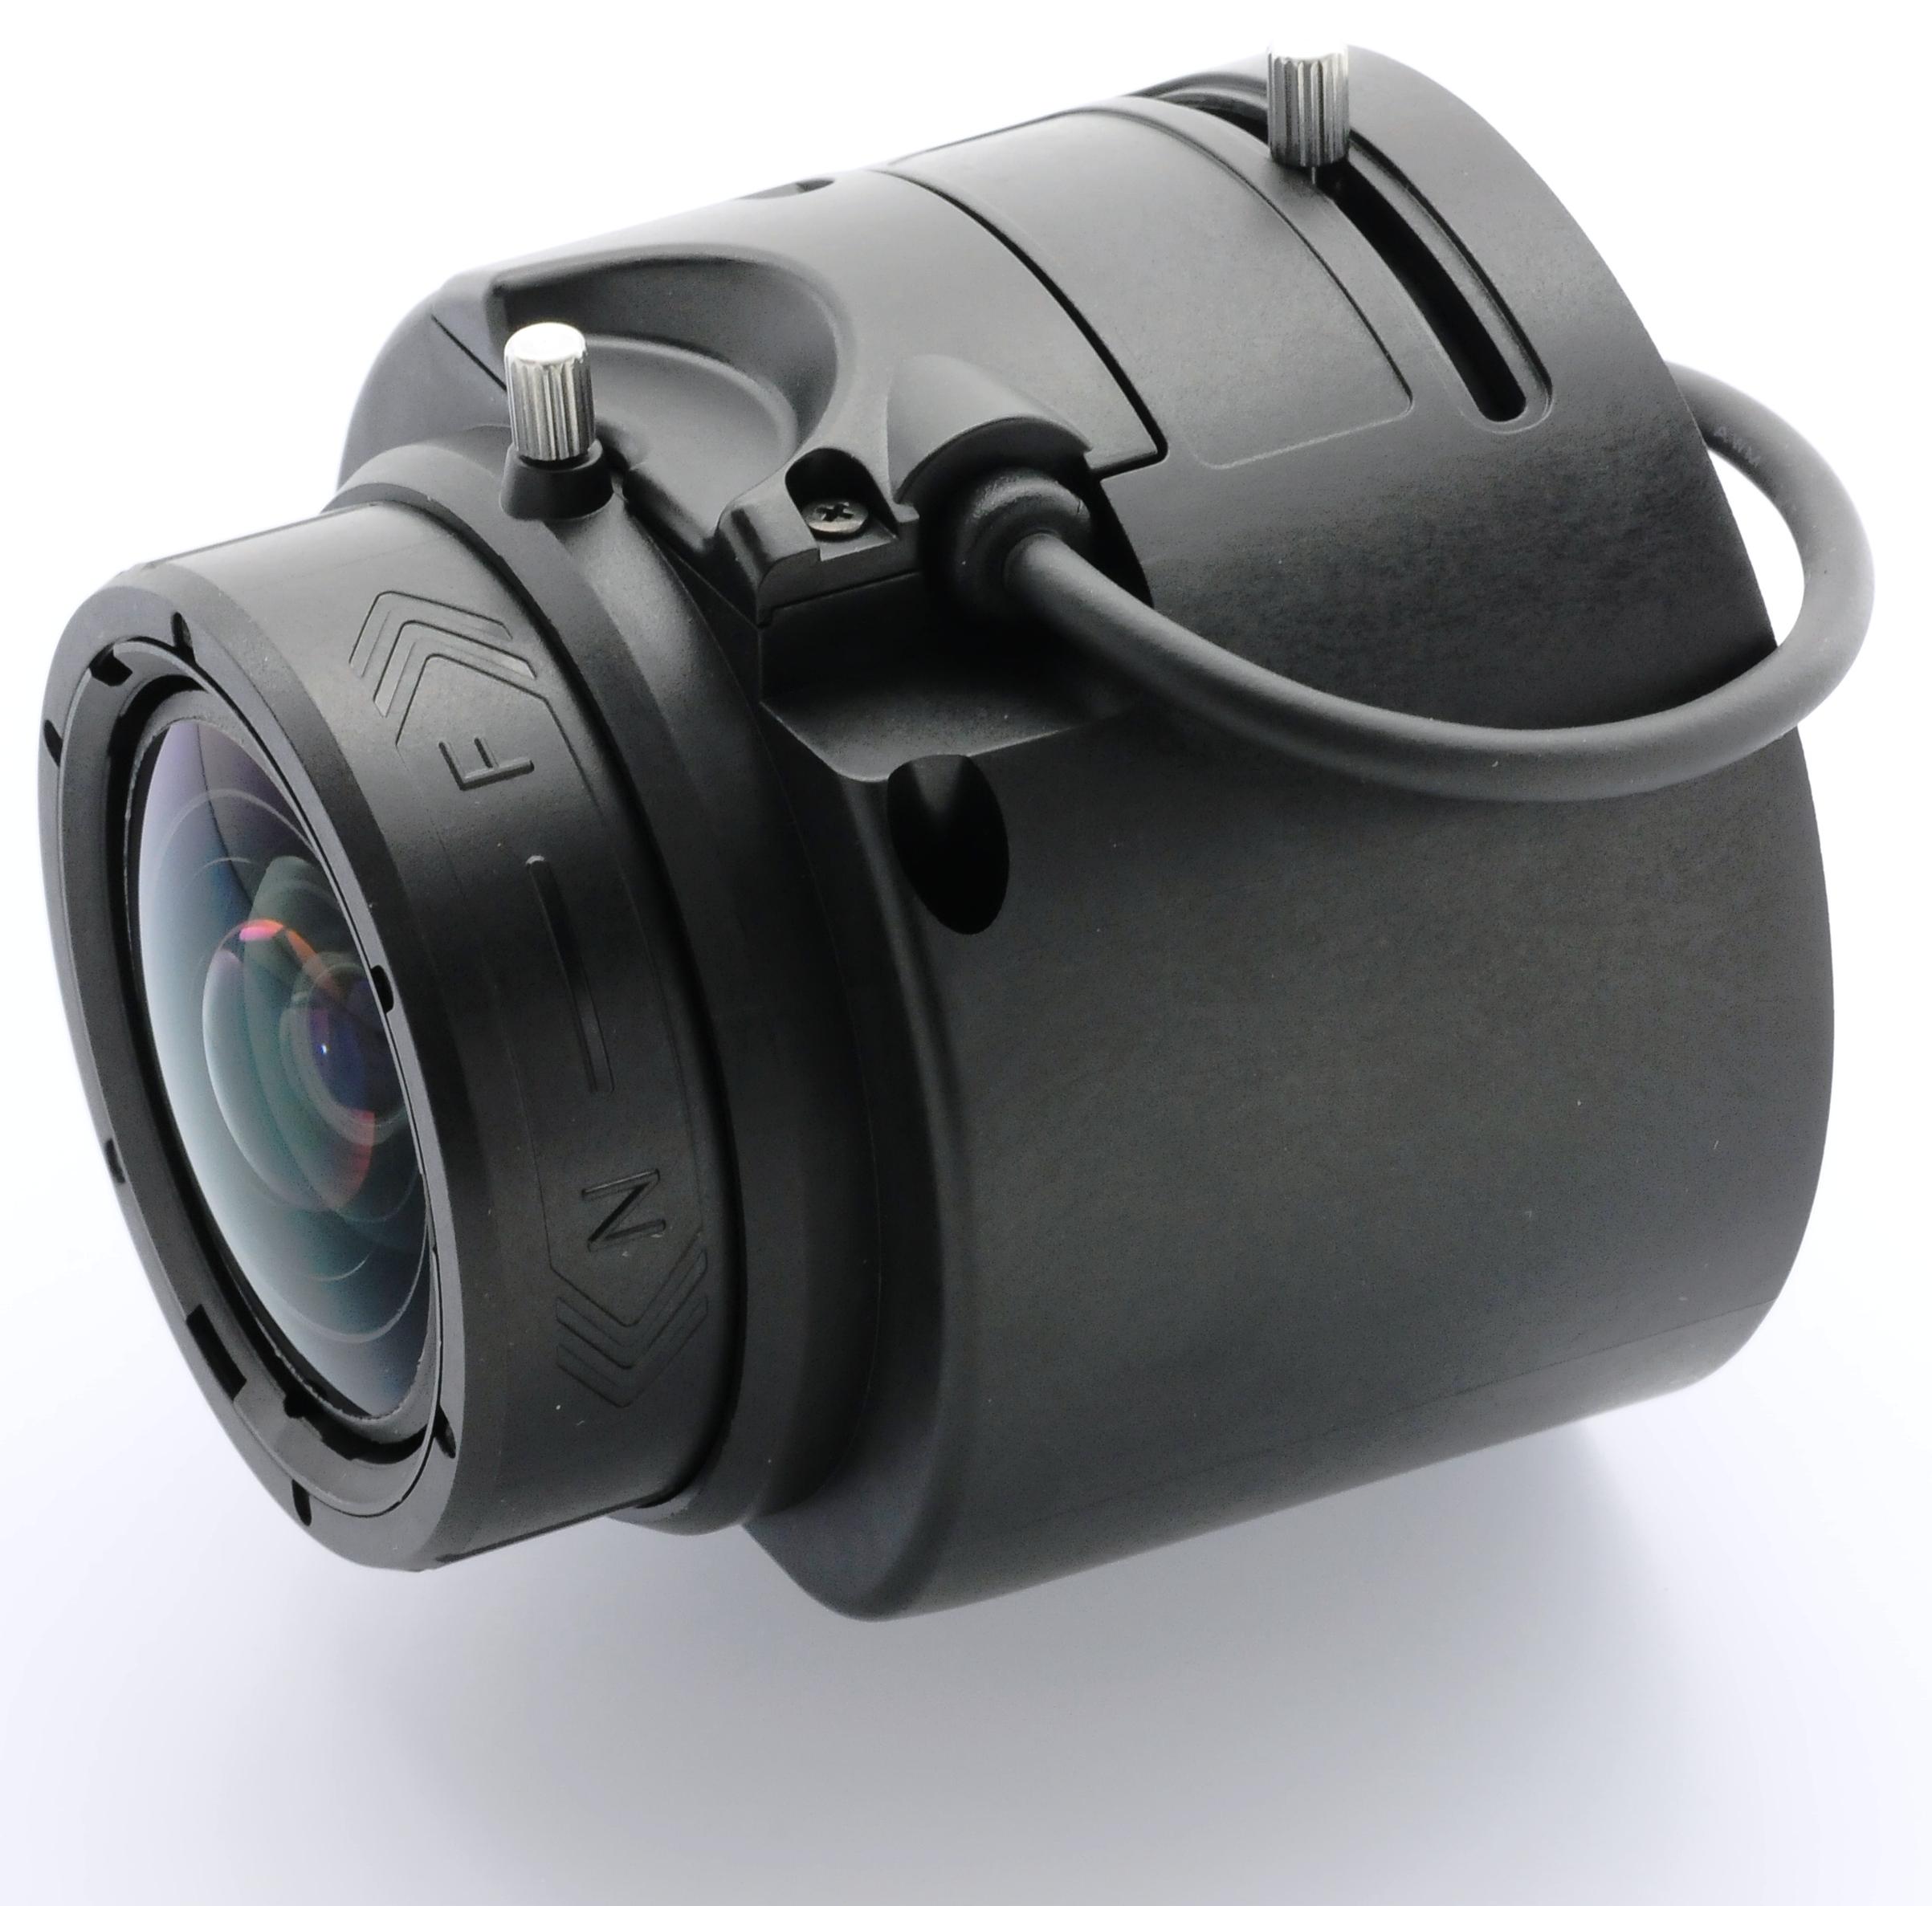 Fujinon DV2.2x4.1SR4A SA2L 6 Megapixel Lens